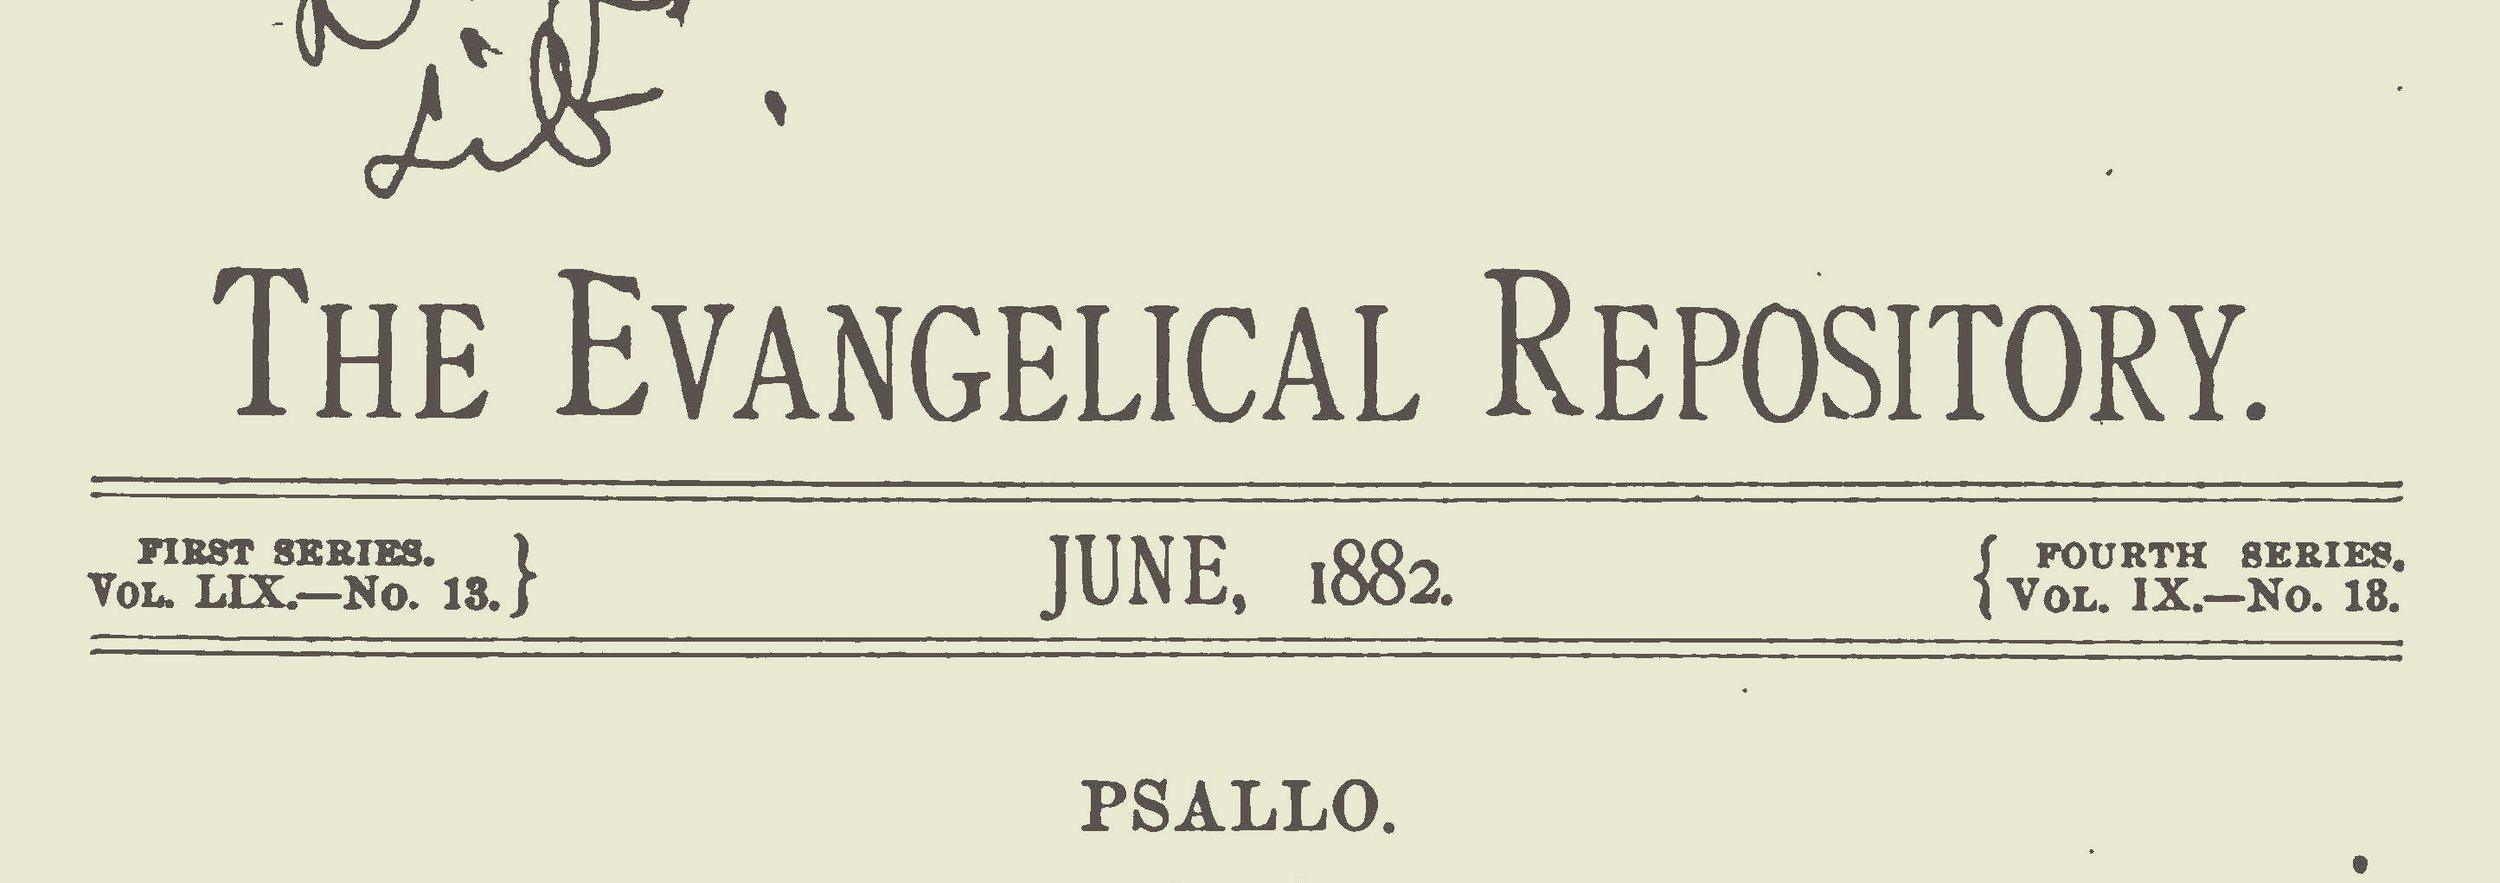 Wishart, William, Psallo Title Page.jpg